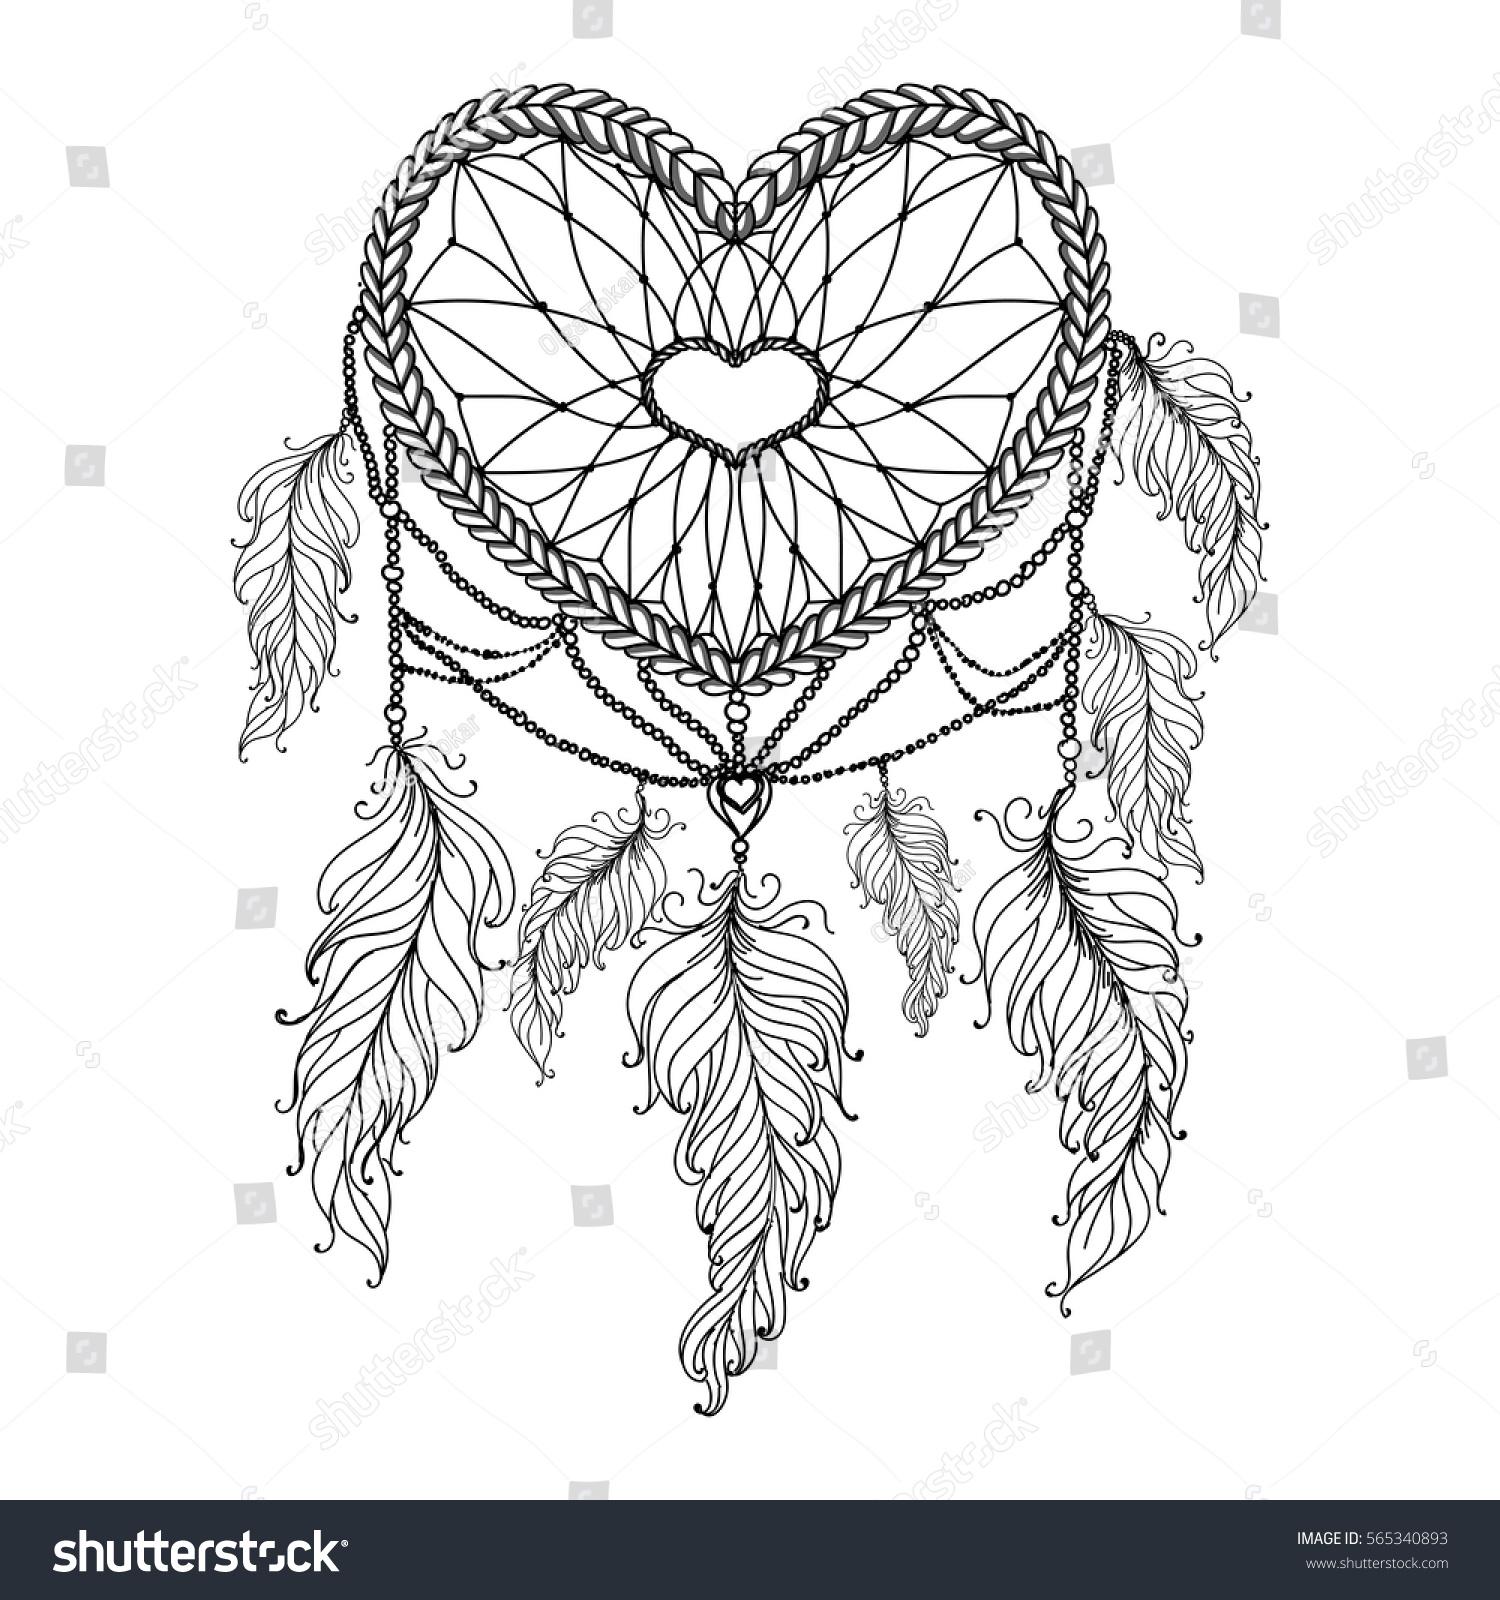 Dream Catcher Native American Indian Traditional Dream Catch ER Heart Shape